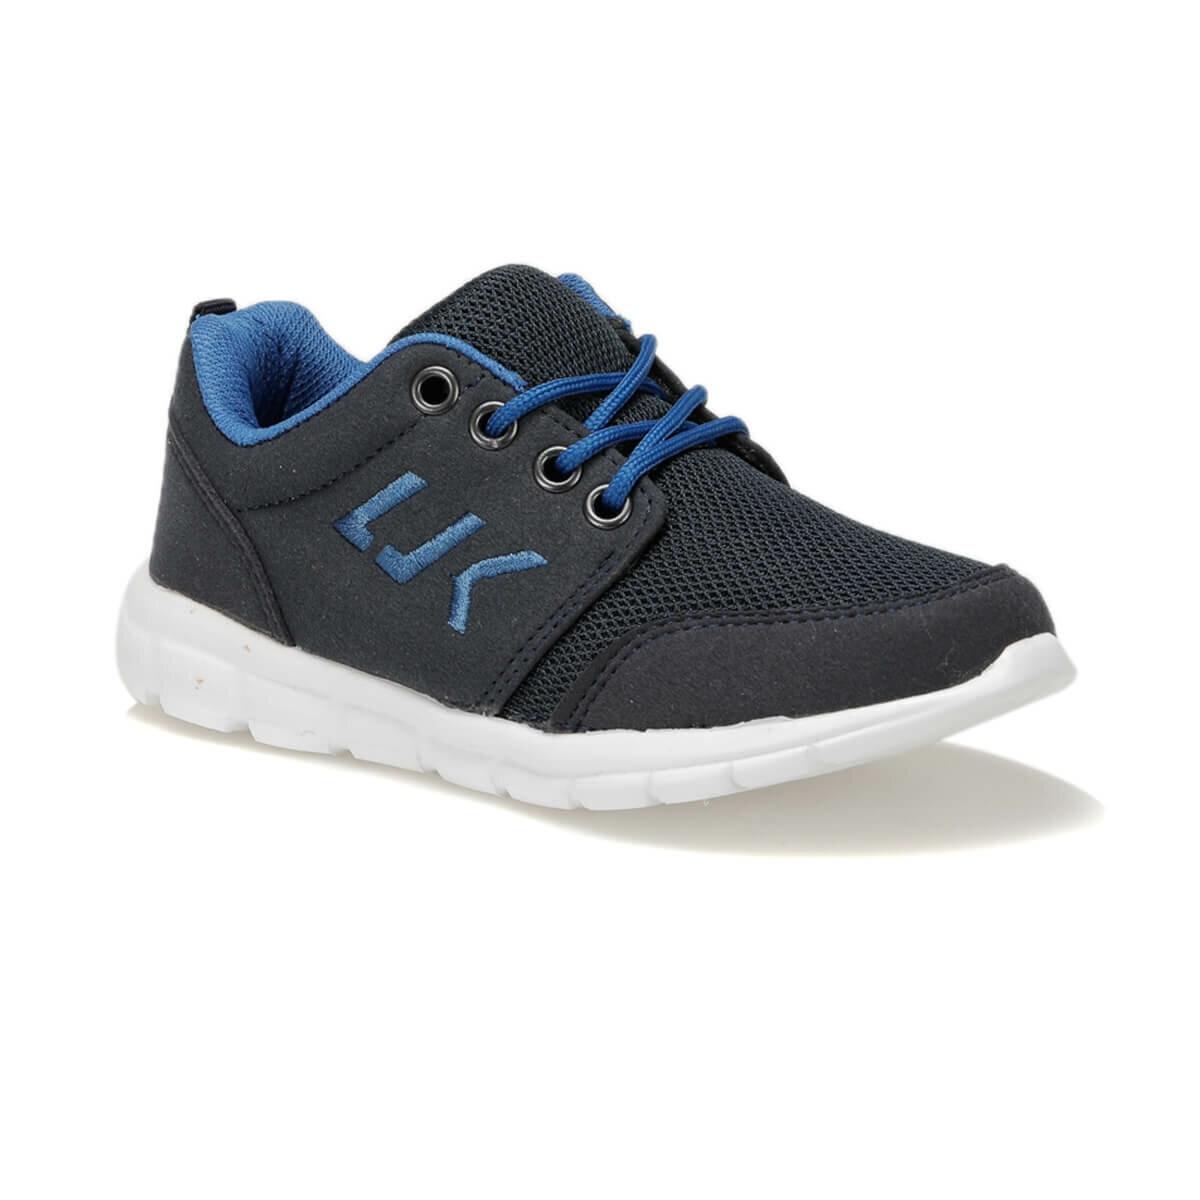 FLO SMASH Navy Blue Male Child Sneaker Shoes LUMBERJACK